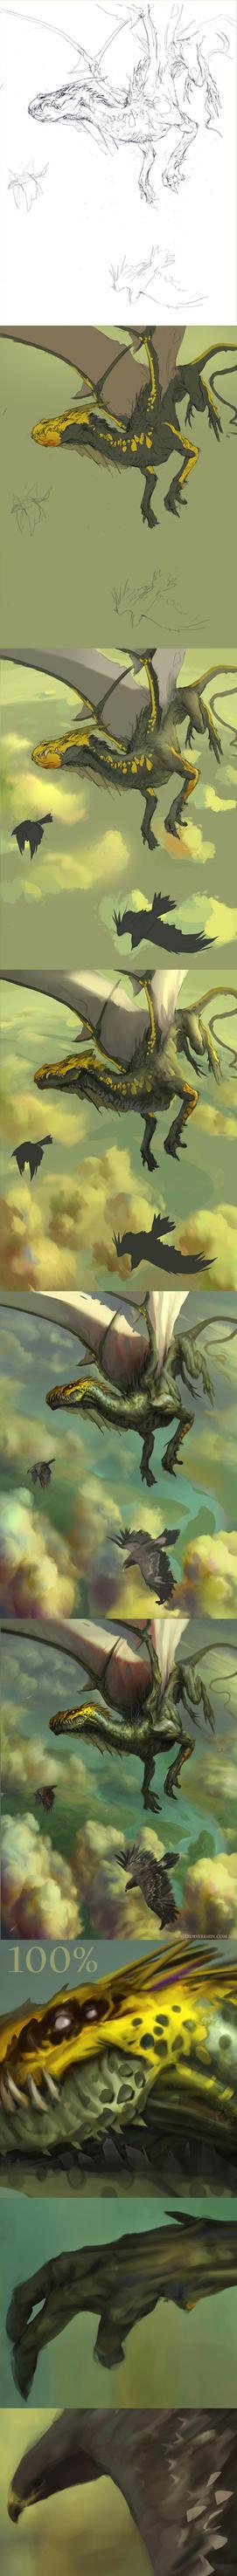 Green dragon- steps by Verehin